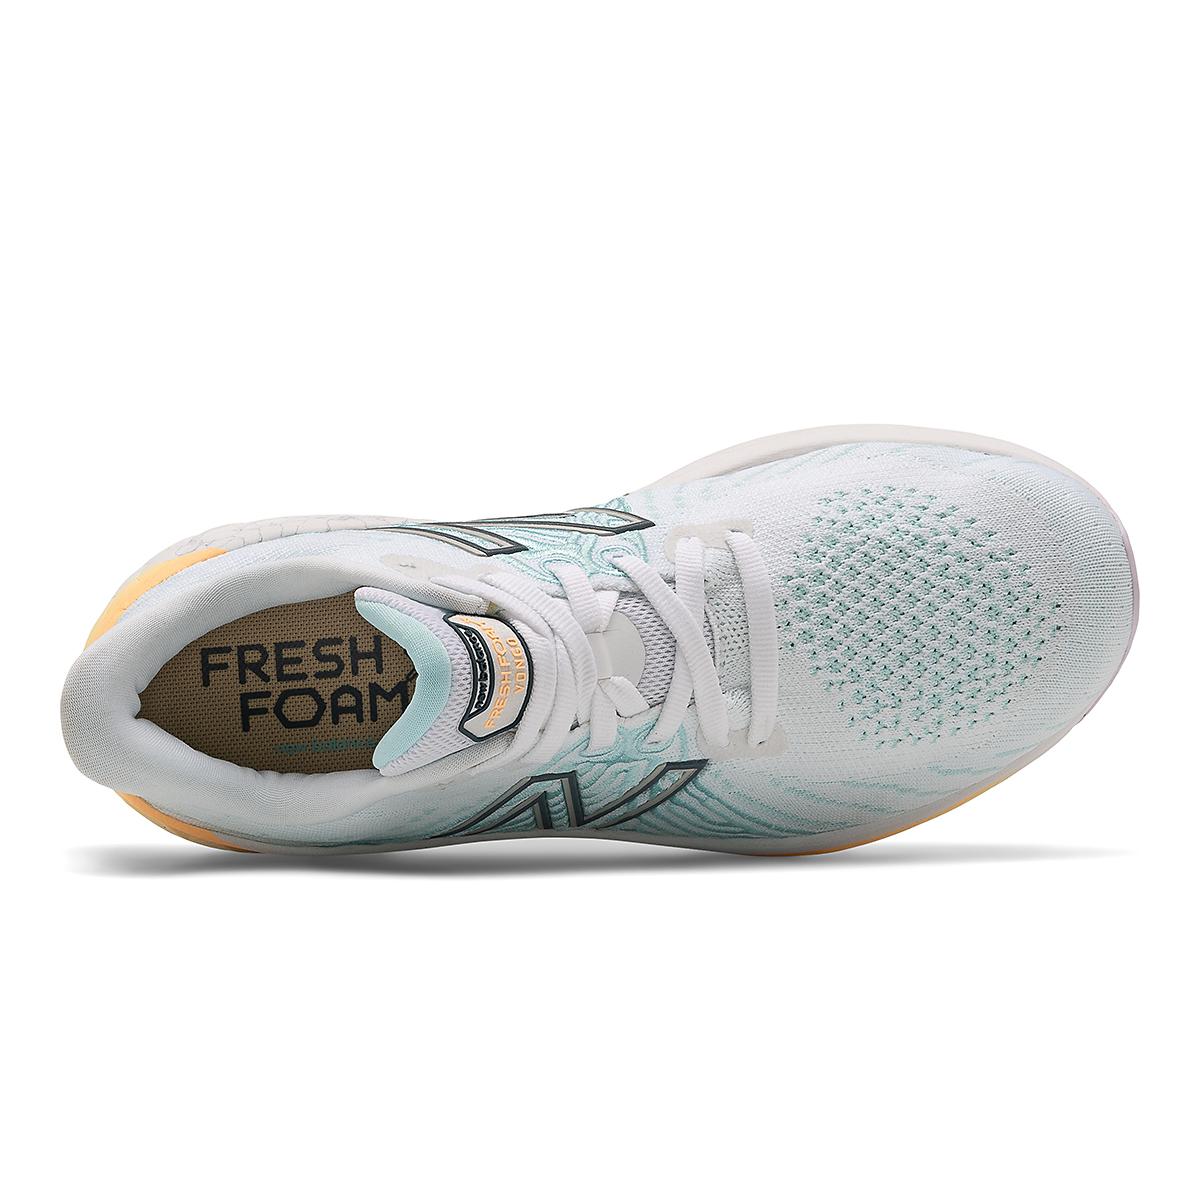 Women's New Balance Fresh Foam Vongo V5 Running Shoe - Color: White/Light Mango - Size: 5 - Width: Regular, White/Light Mango, large, image 4